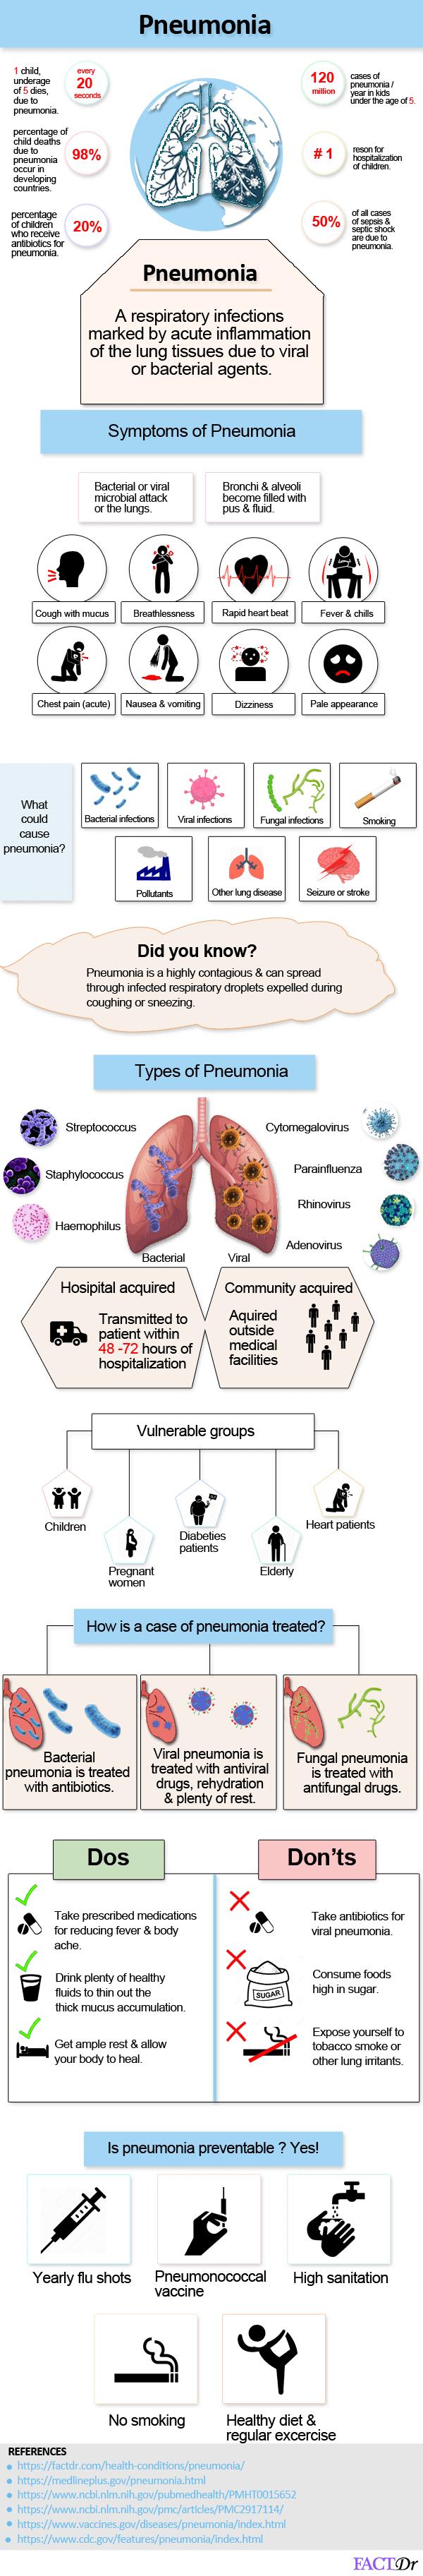 Pneumonia infographic